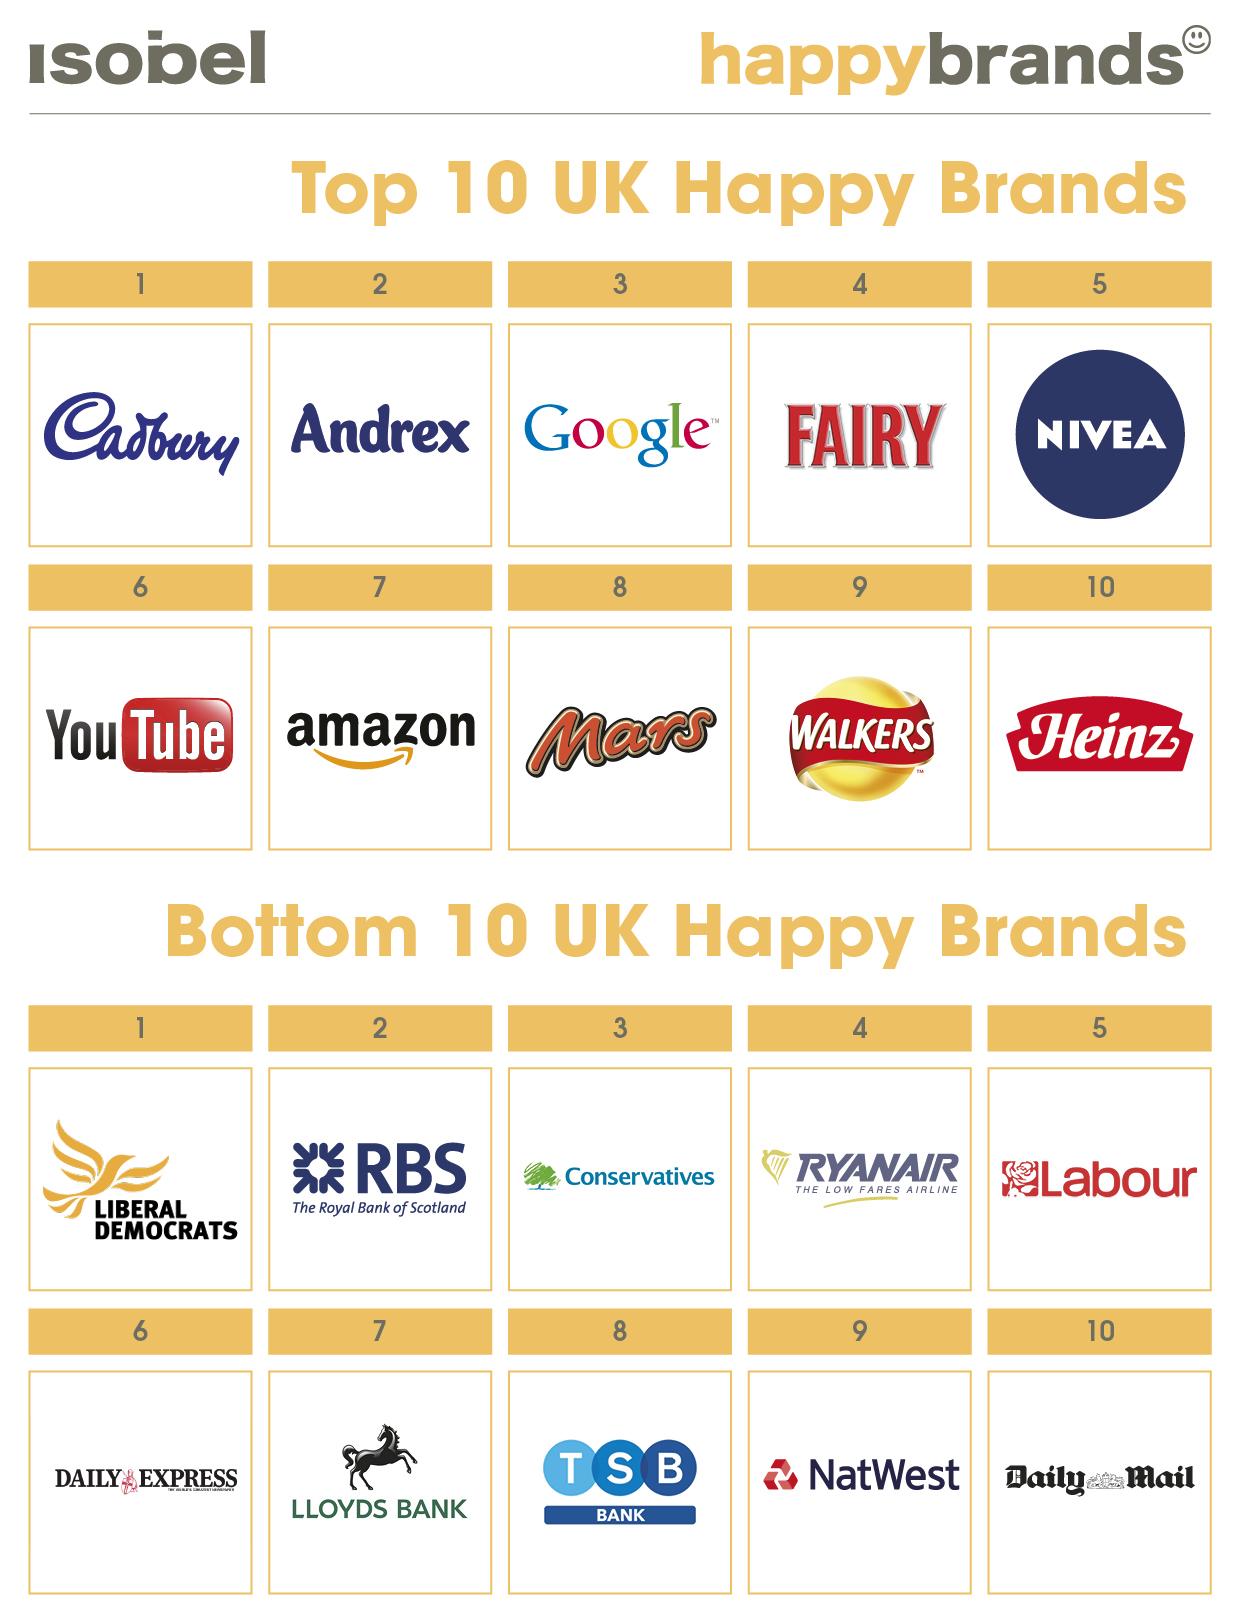 isobel_happy_brands_02